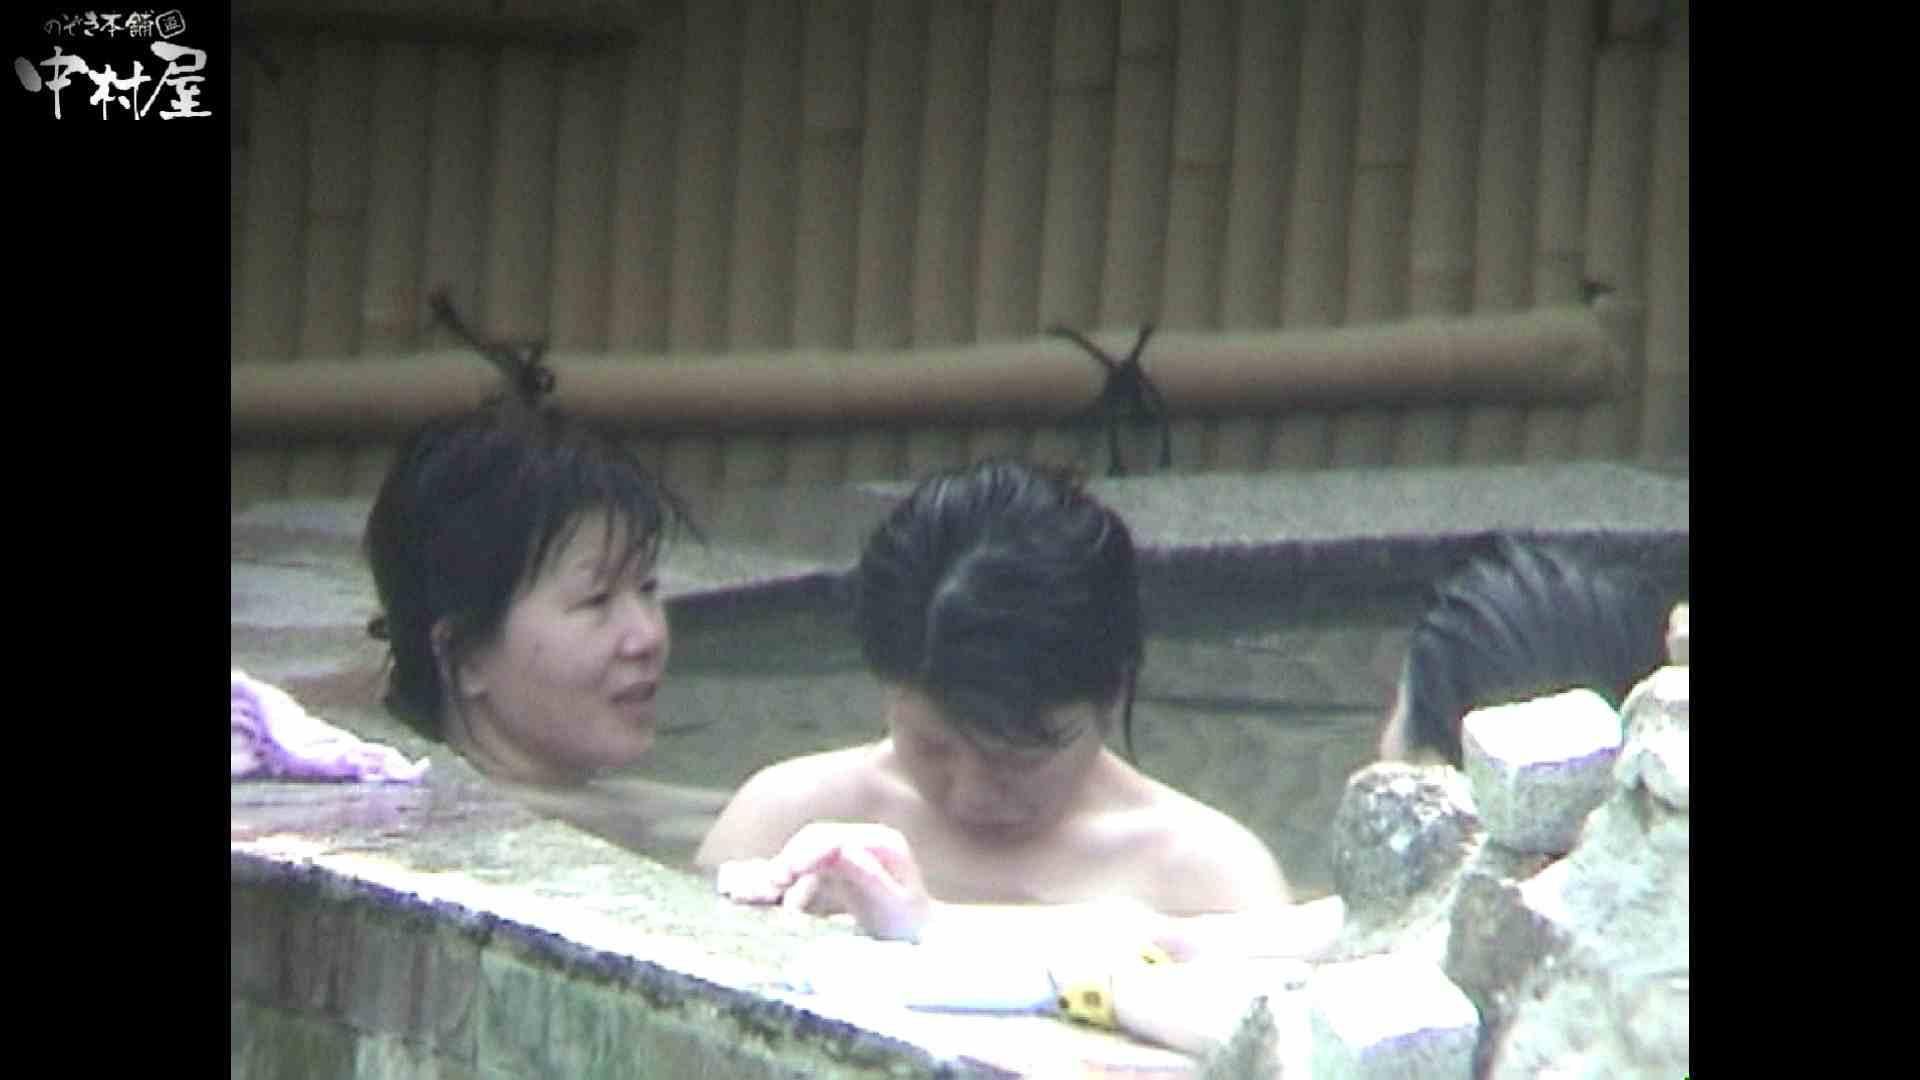 Aquaな露天風呂Vol.936 0  9連発 6